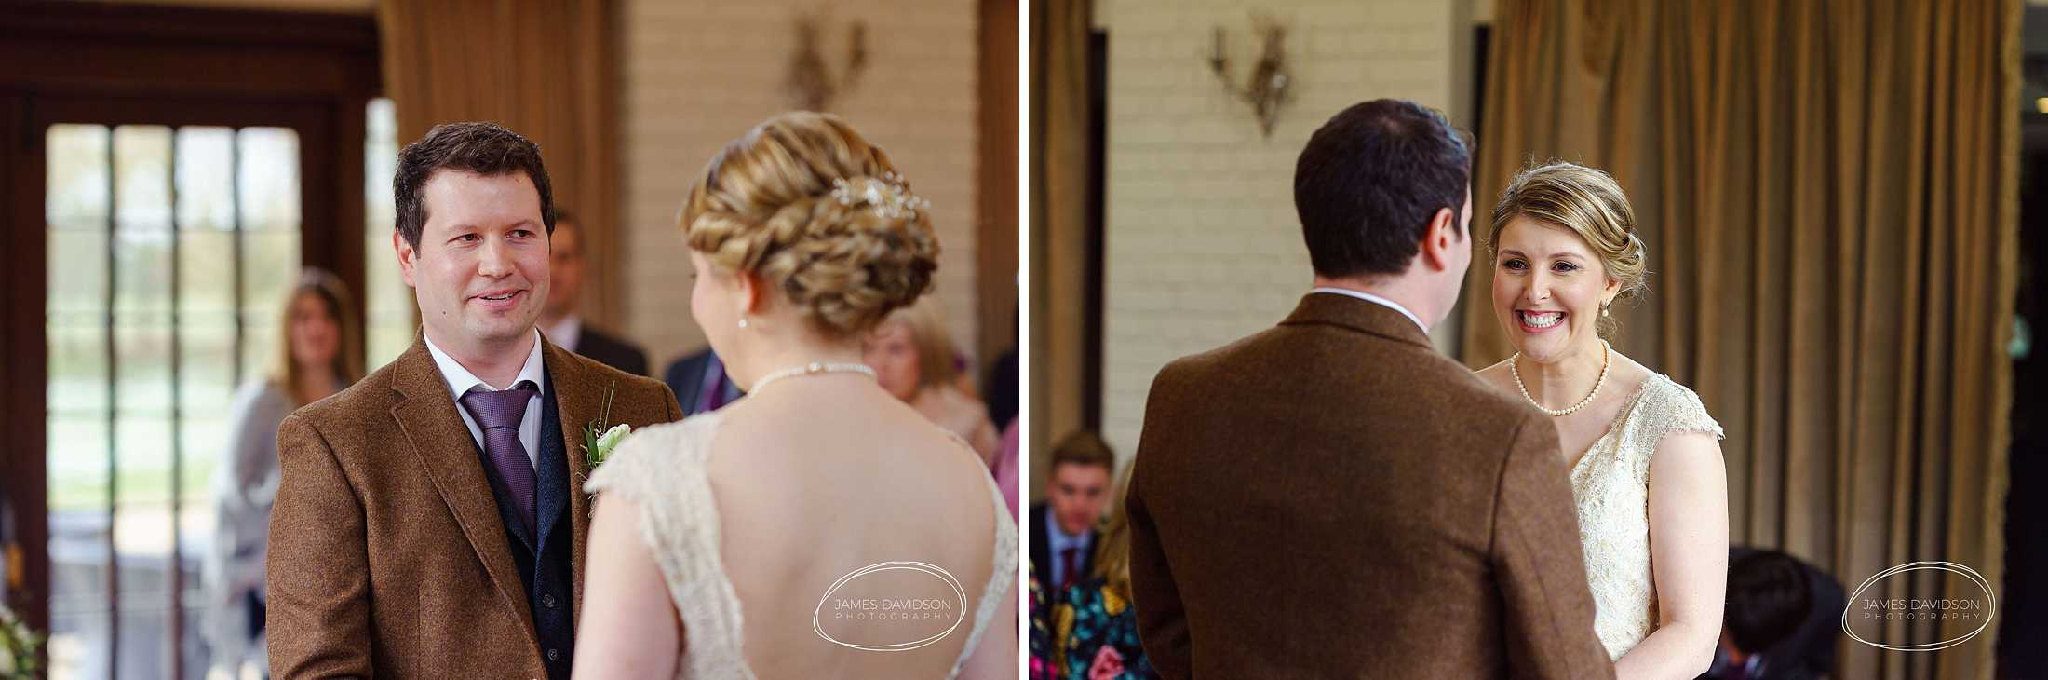 seckford-hall-wedding-037